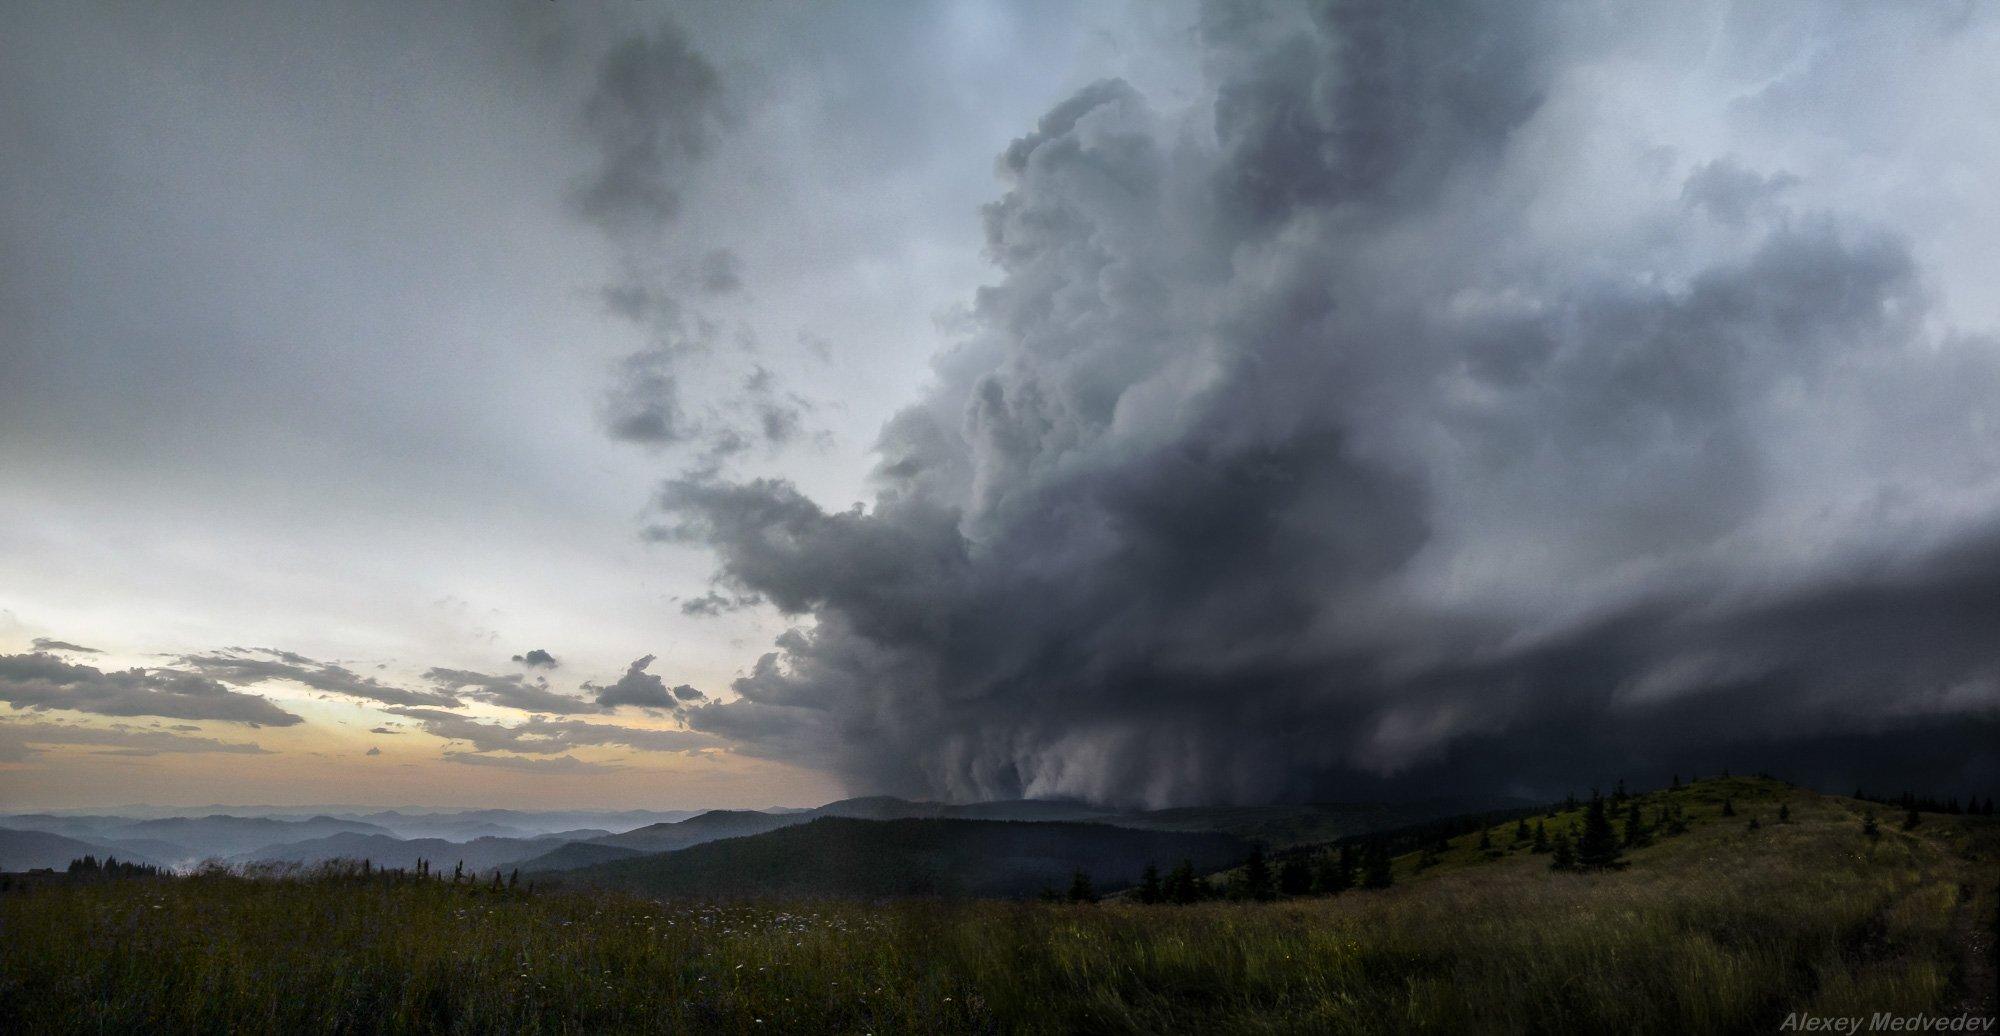 шторм, горы, циклон, облака, буря, гроза, Карпати, полонина, скеля, сонце, Чорногора, зірка, Карпаты,, Алексей Медведев